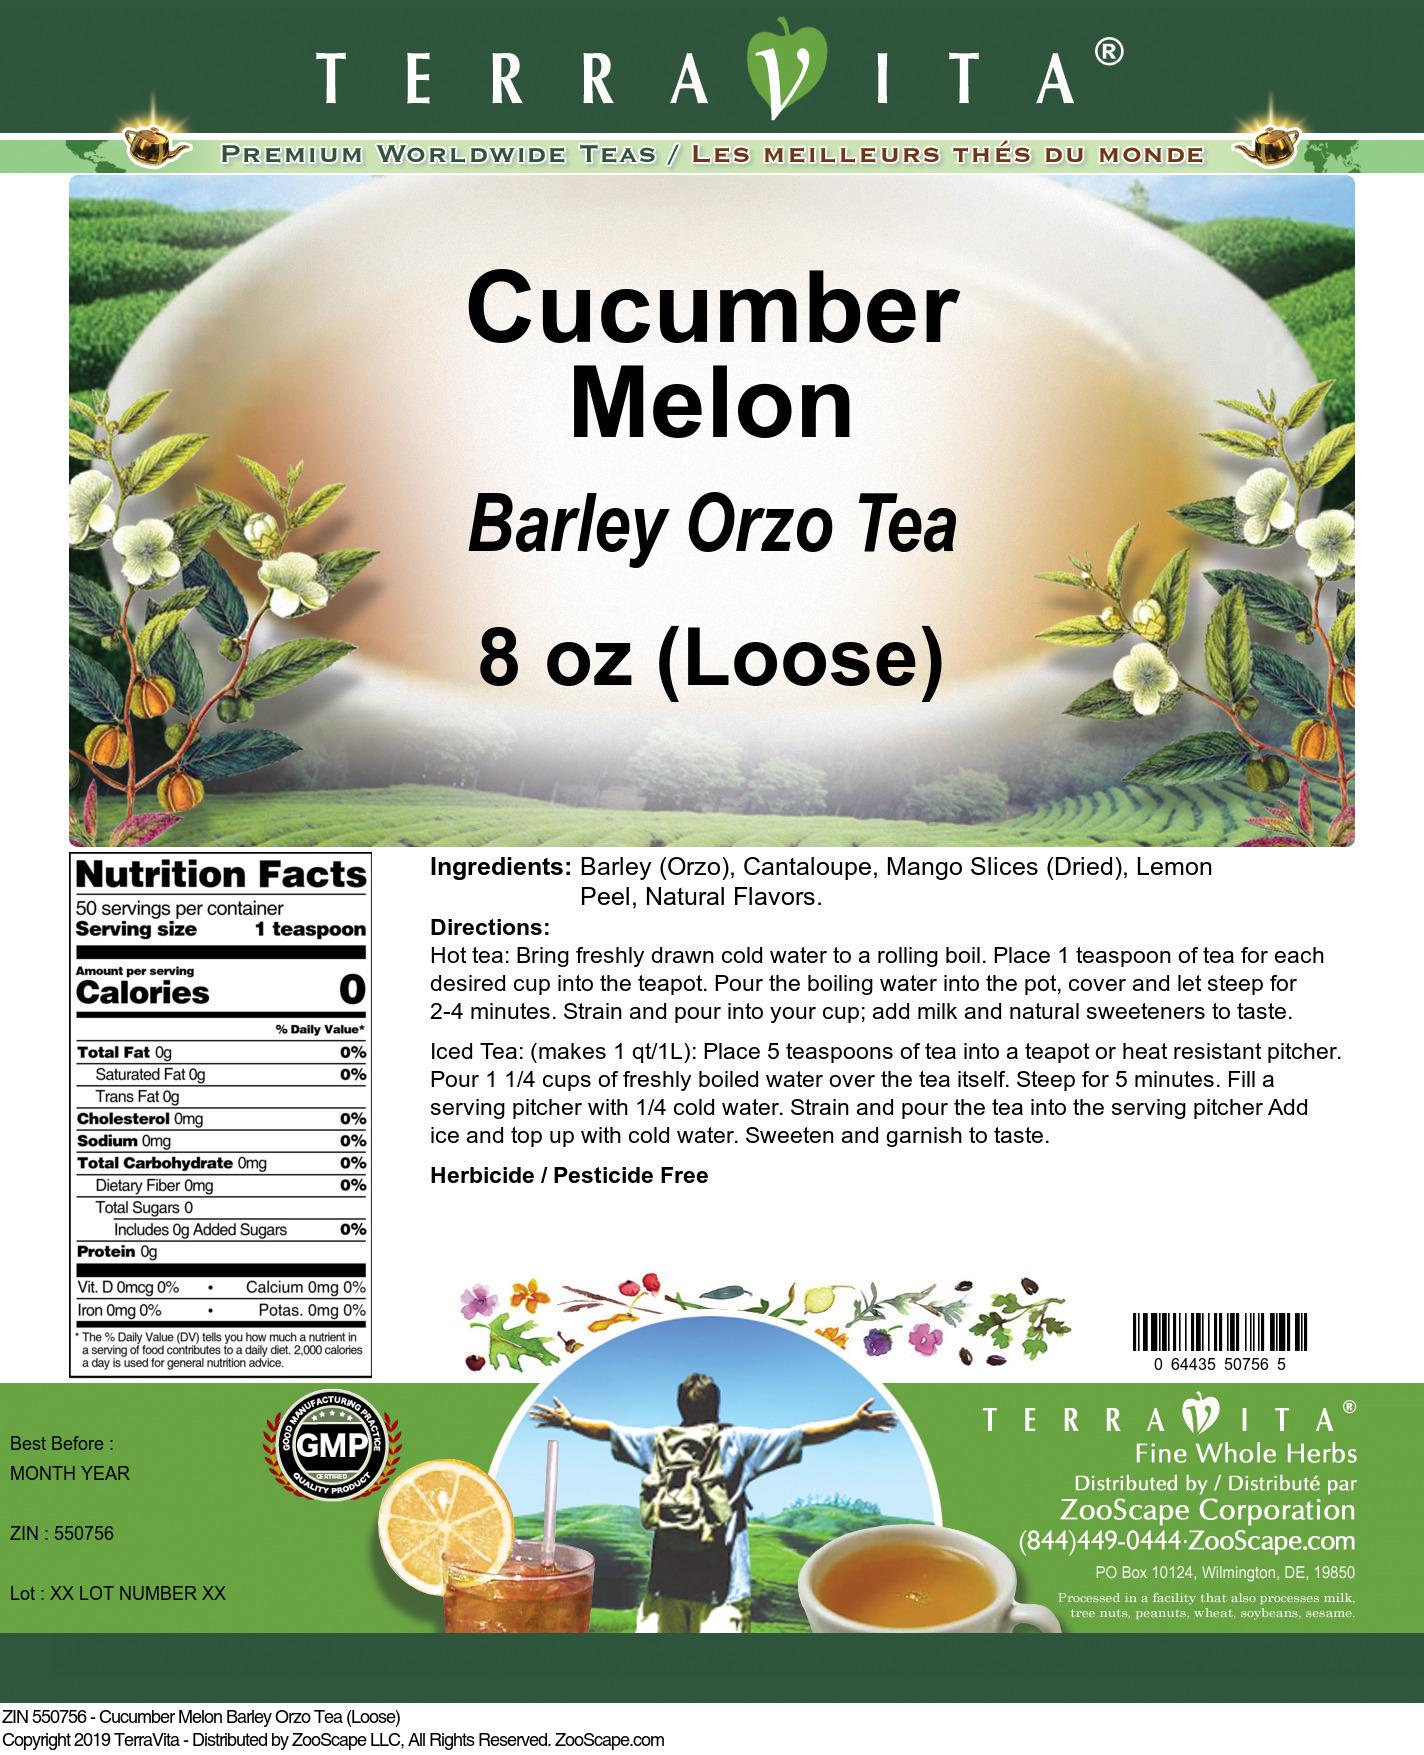 Cucumber Melon Barley Orzo